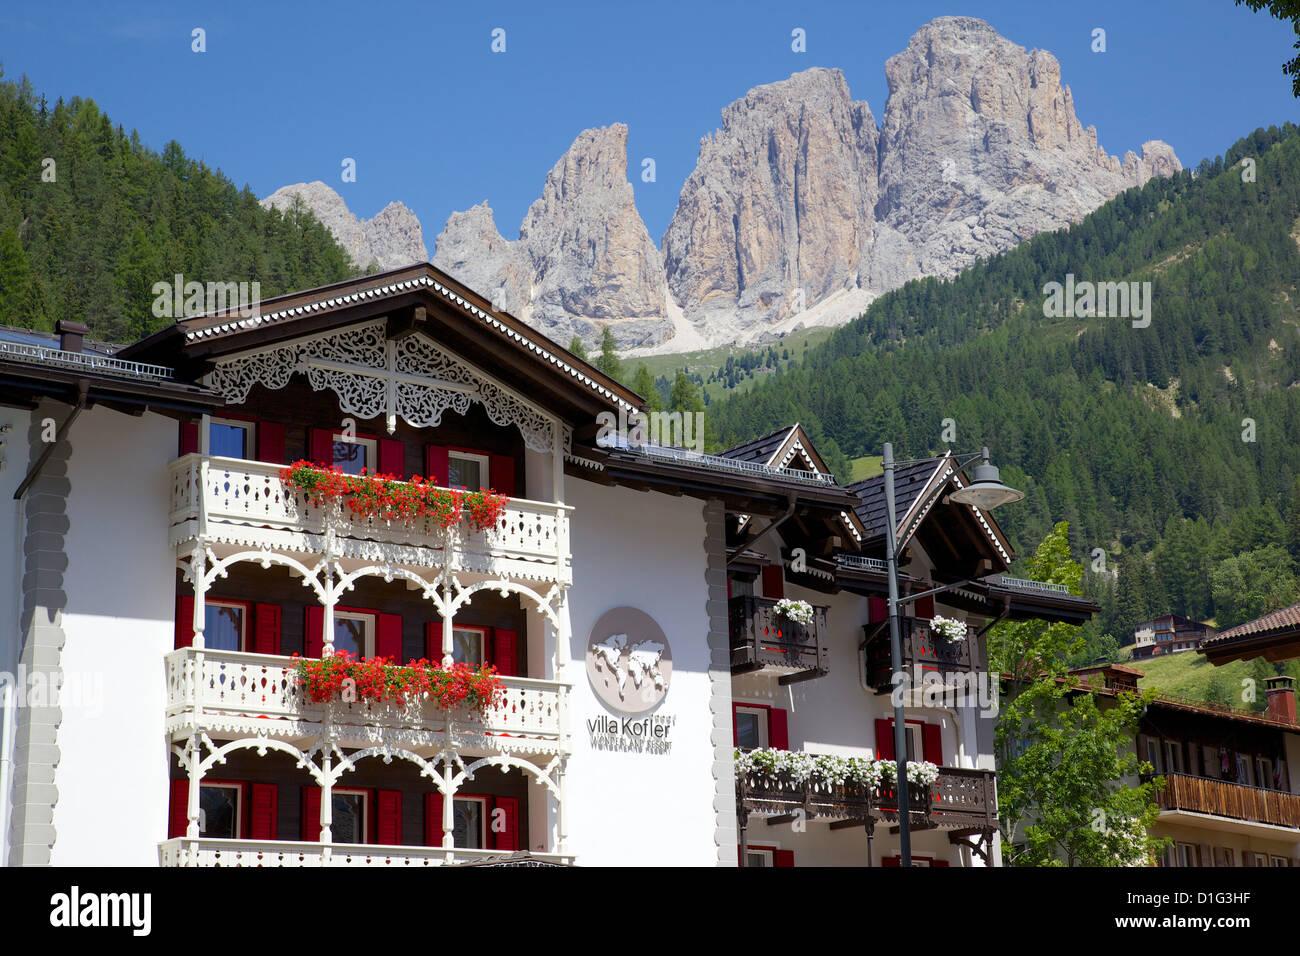 Chalet balconies, Ciampedel, Fassa Valley, Trento Province, Trentino-Alto Adige/South Tyrol, Italian Dolomites, - Stock Image